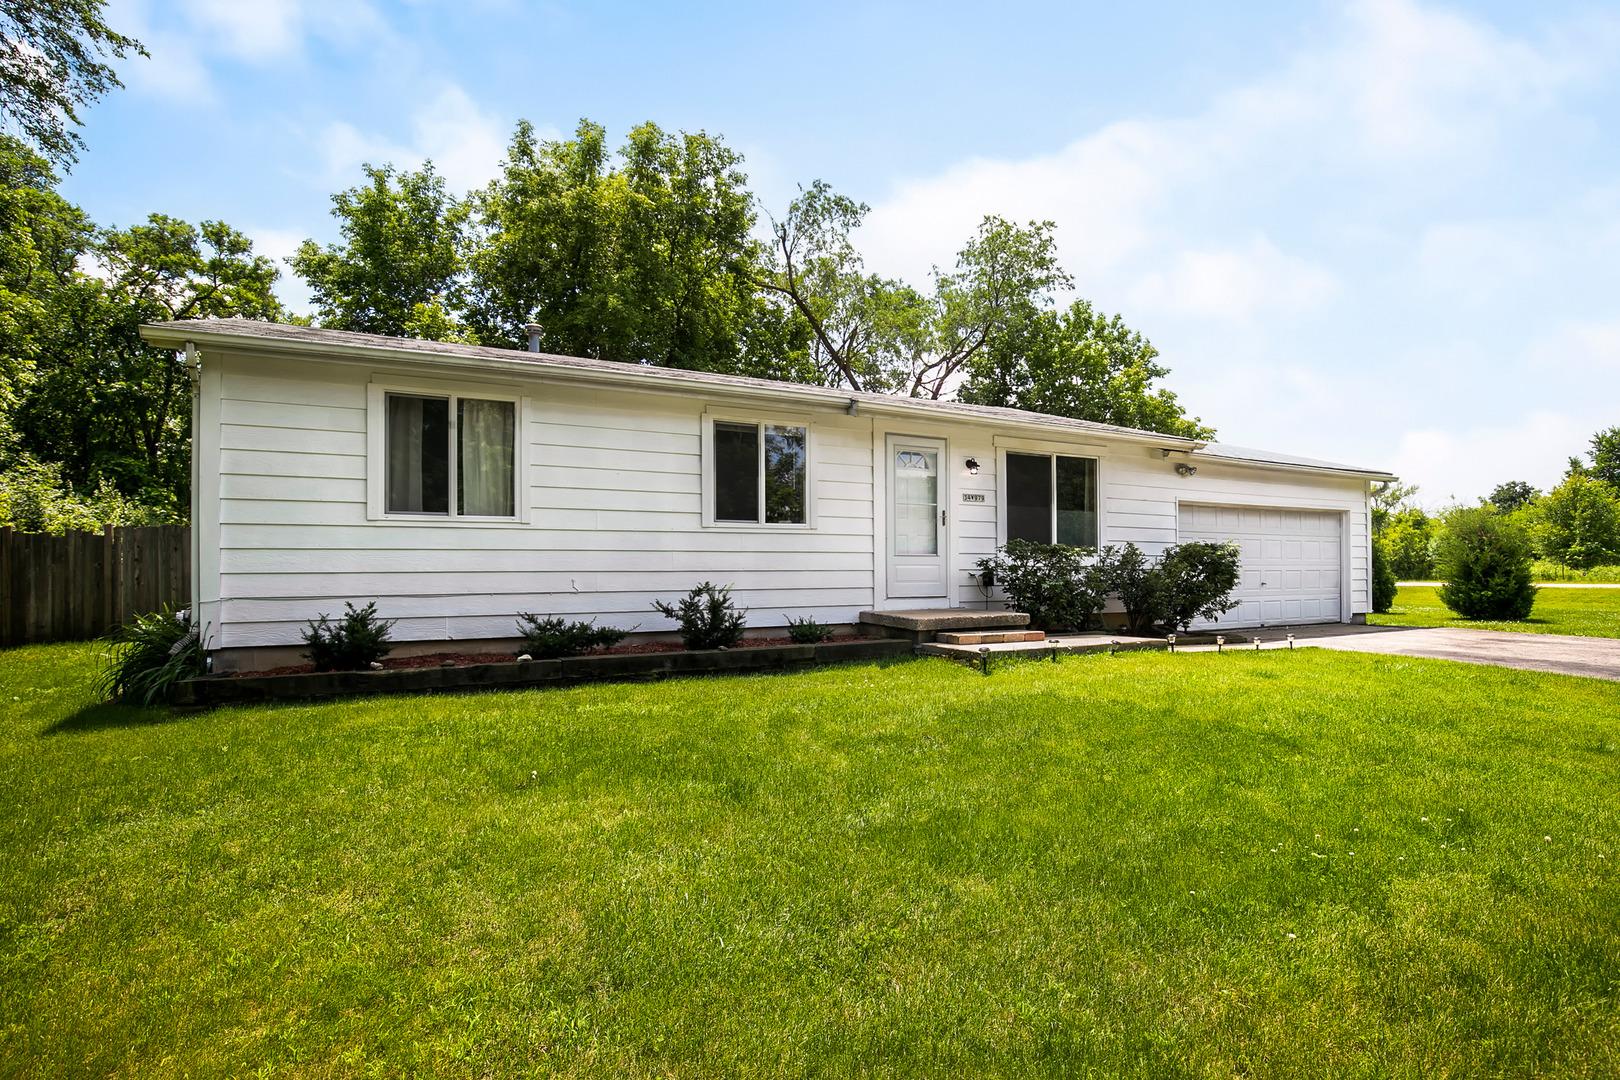 34W979 Stanton, ST. CHARLES, Illinois, 60174